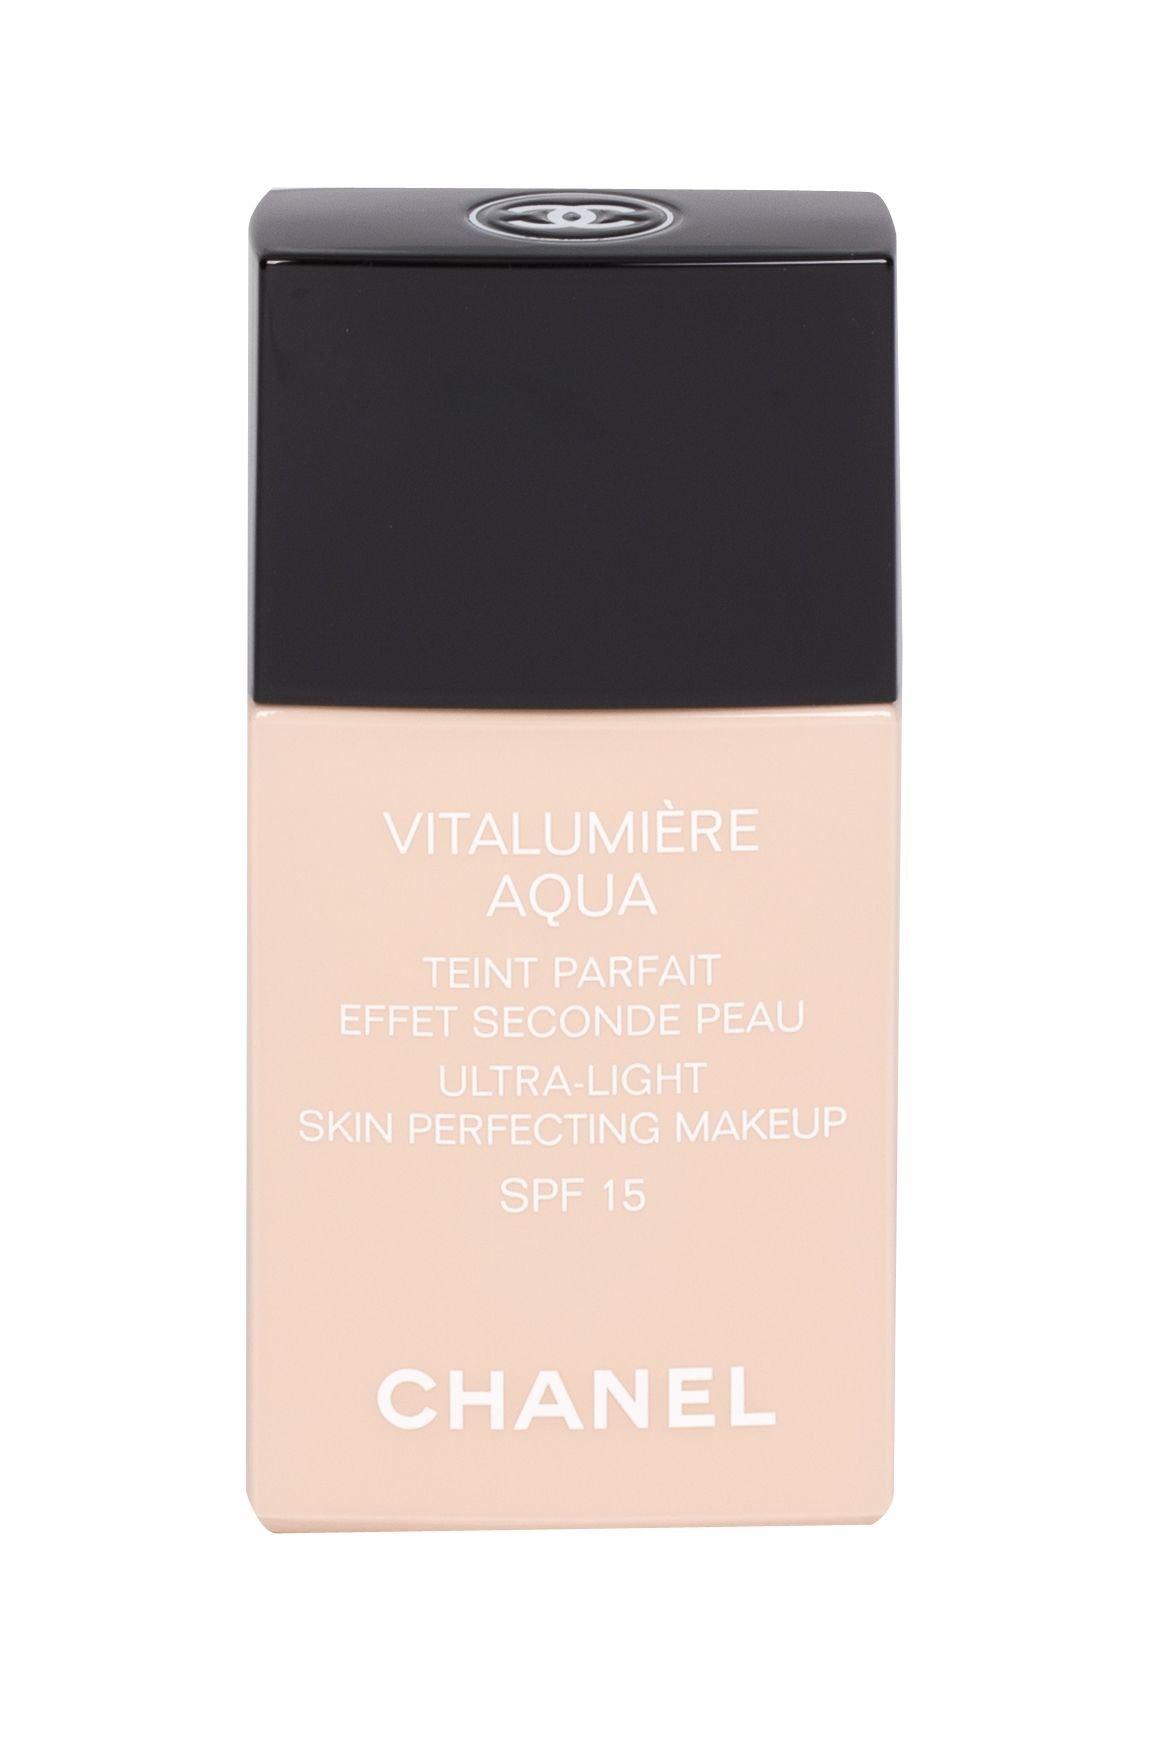 Chanel Vitalumiere Aqua Makeup 30ml 50 Beige